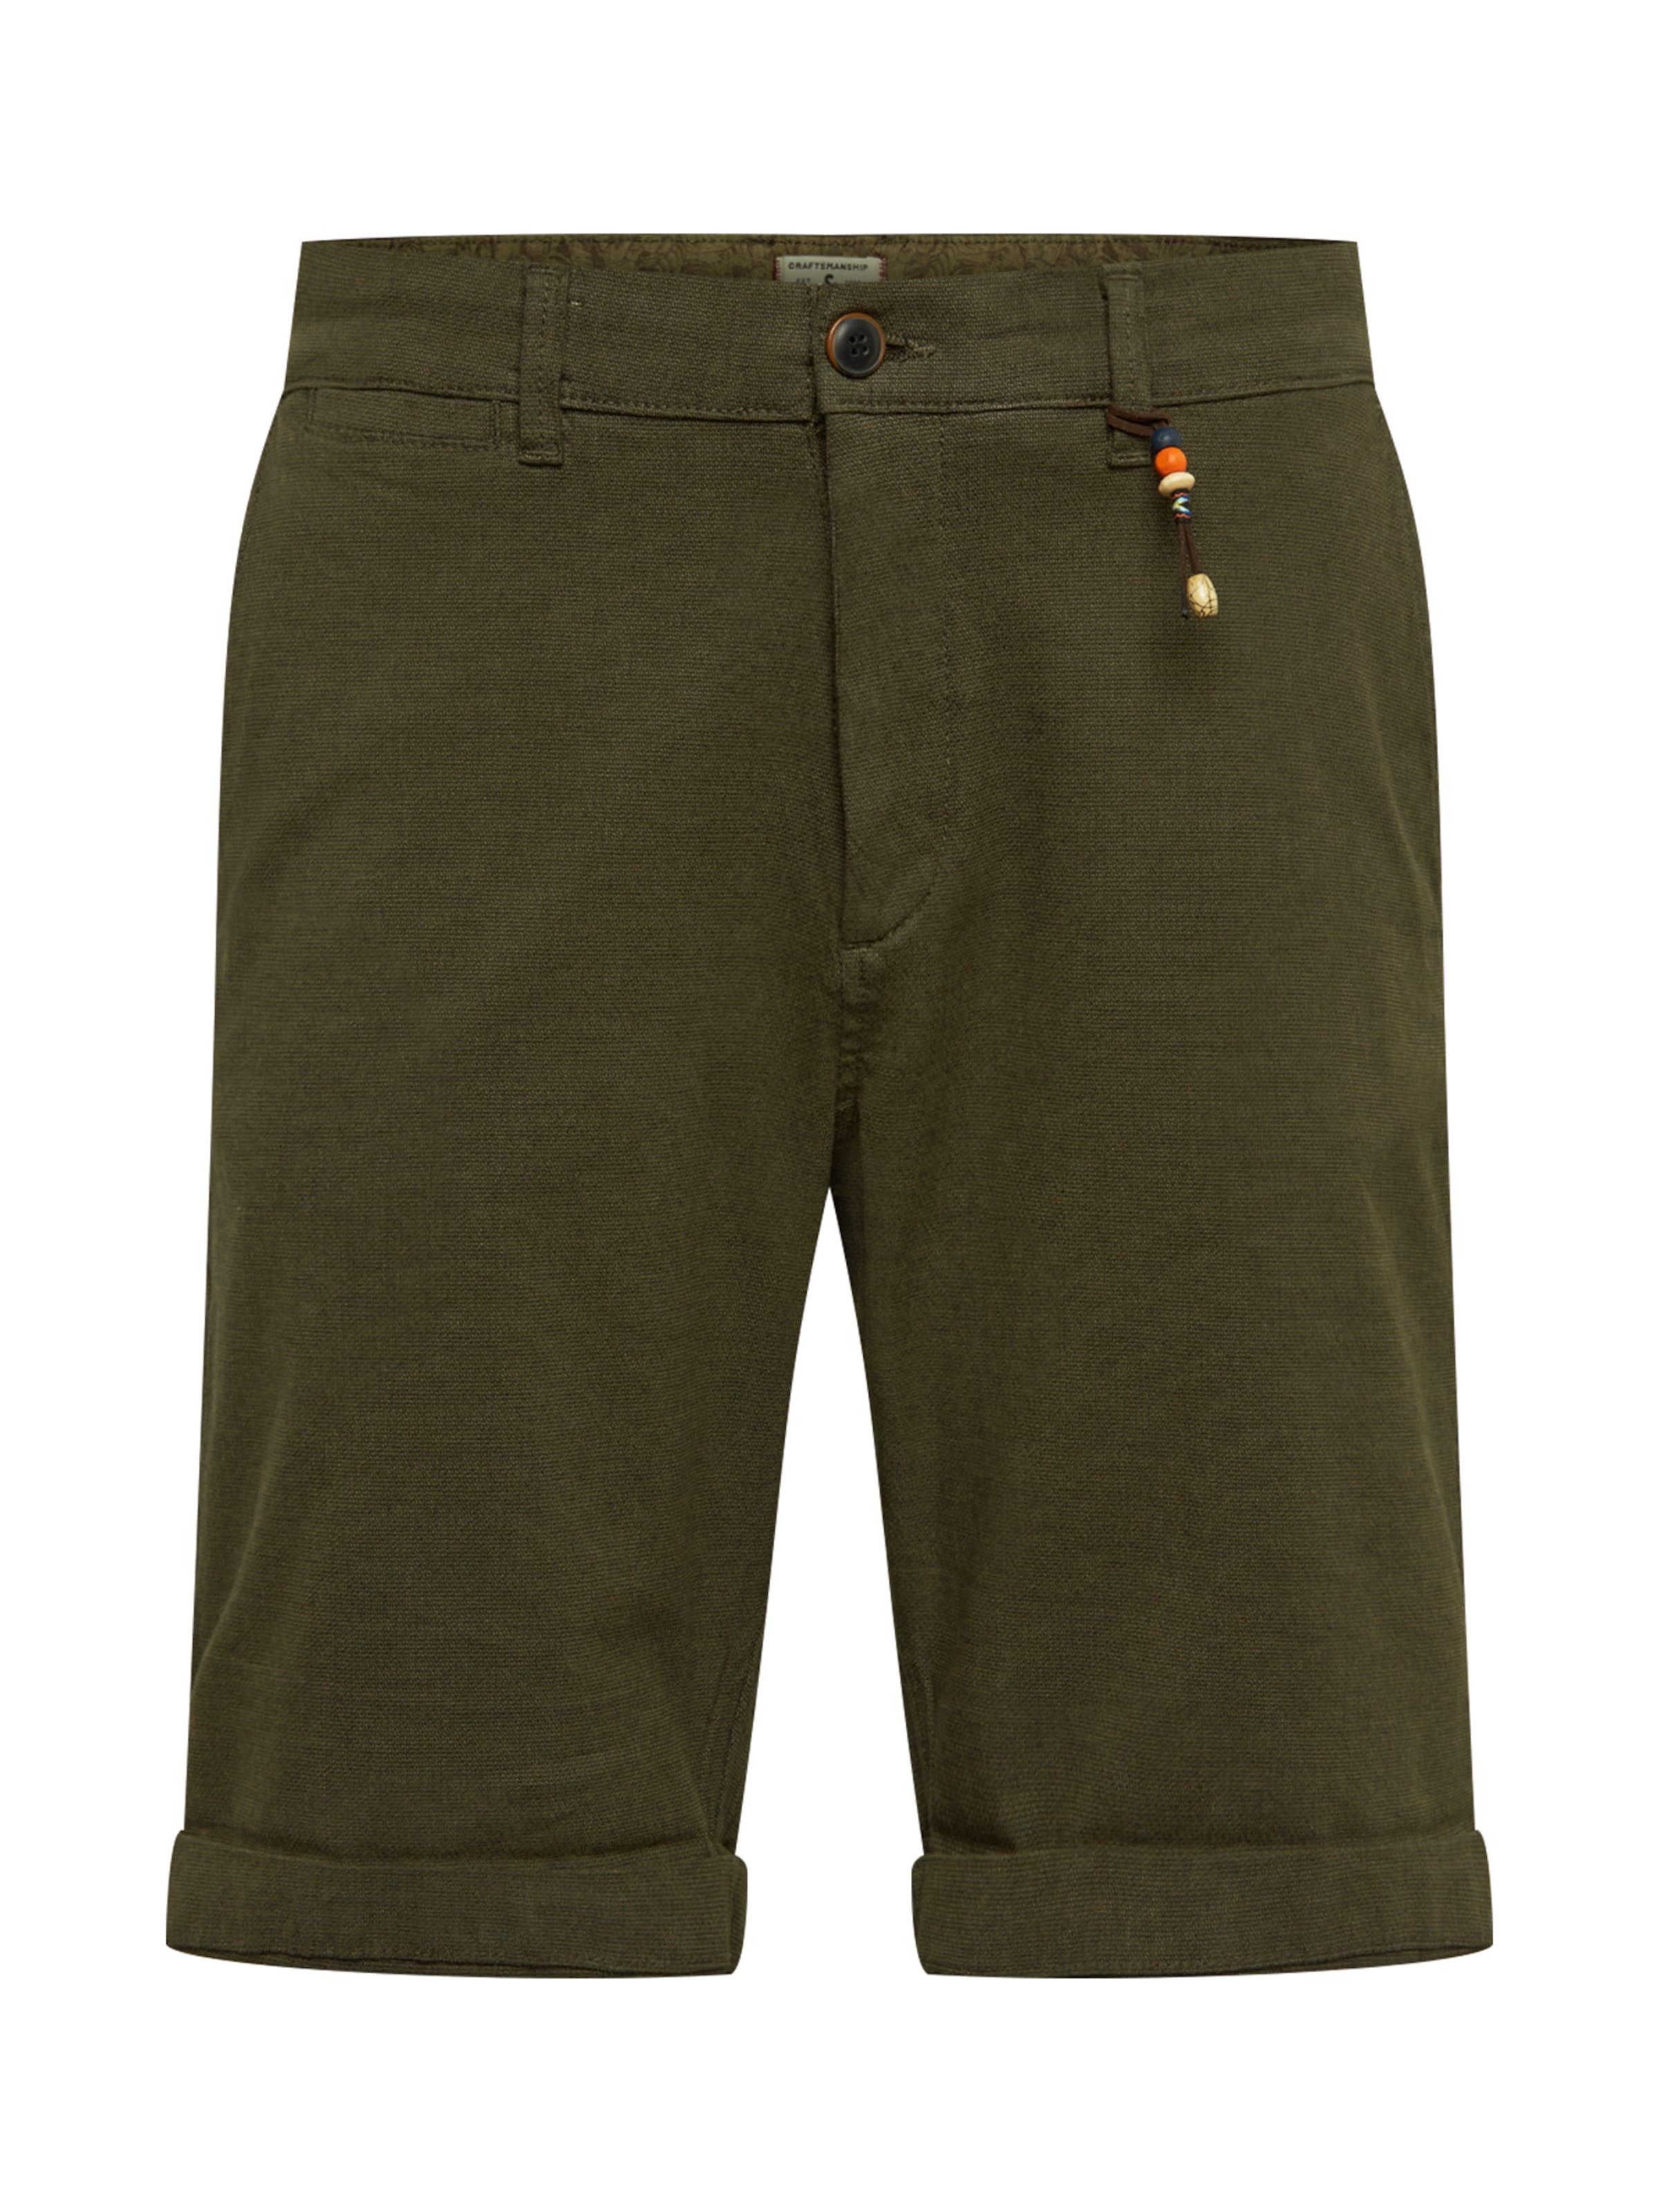 Pantalon Akm Jones En Rouge Chino 432' 'kenzo Cerise Jackamp; yY7g6vbf